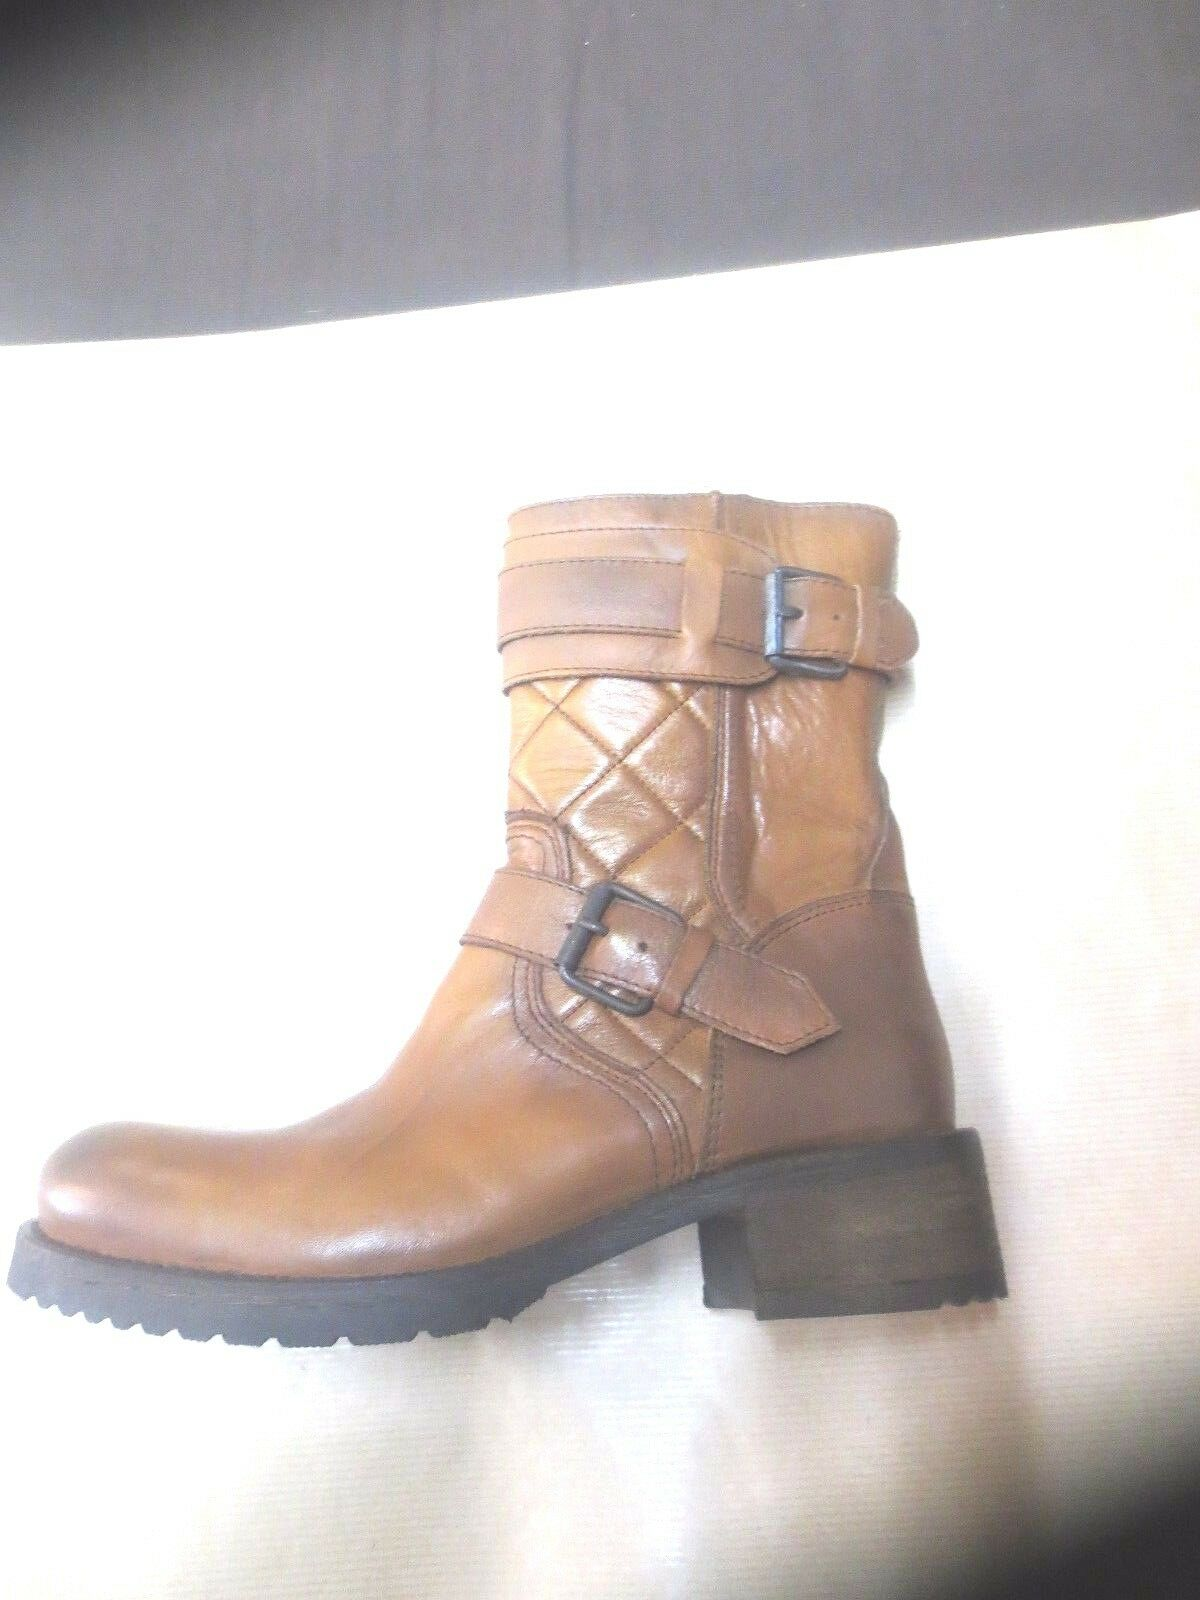 Boots cafè black leather camel new value 155E Size 39